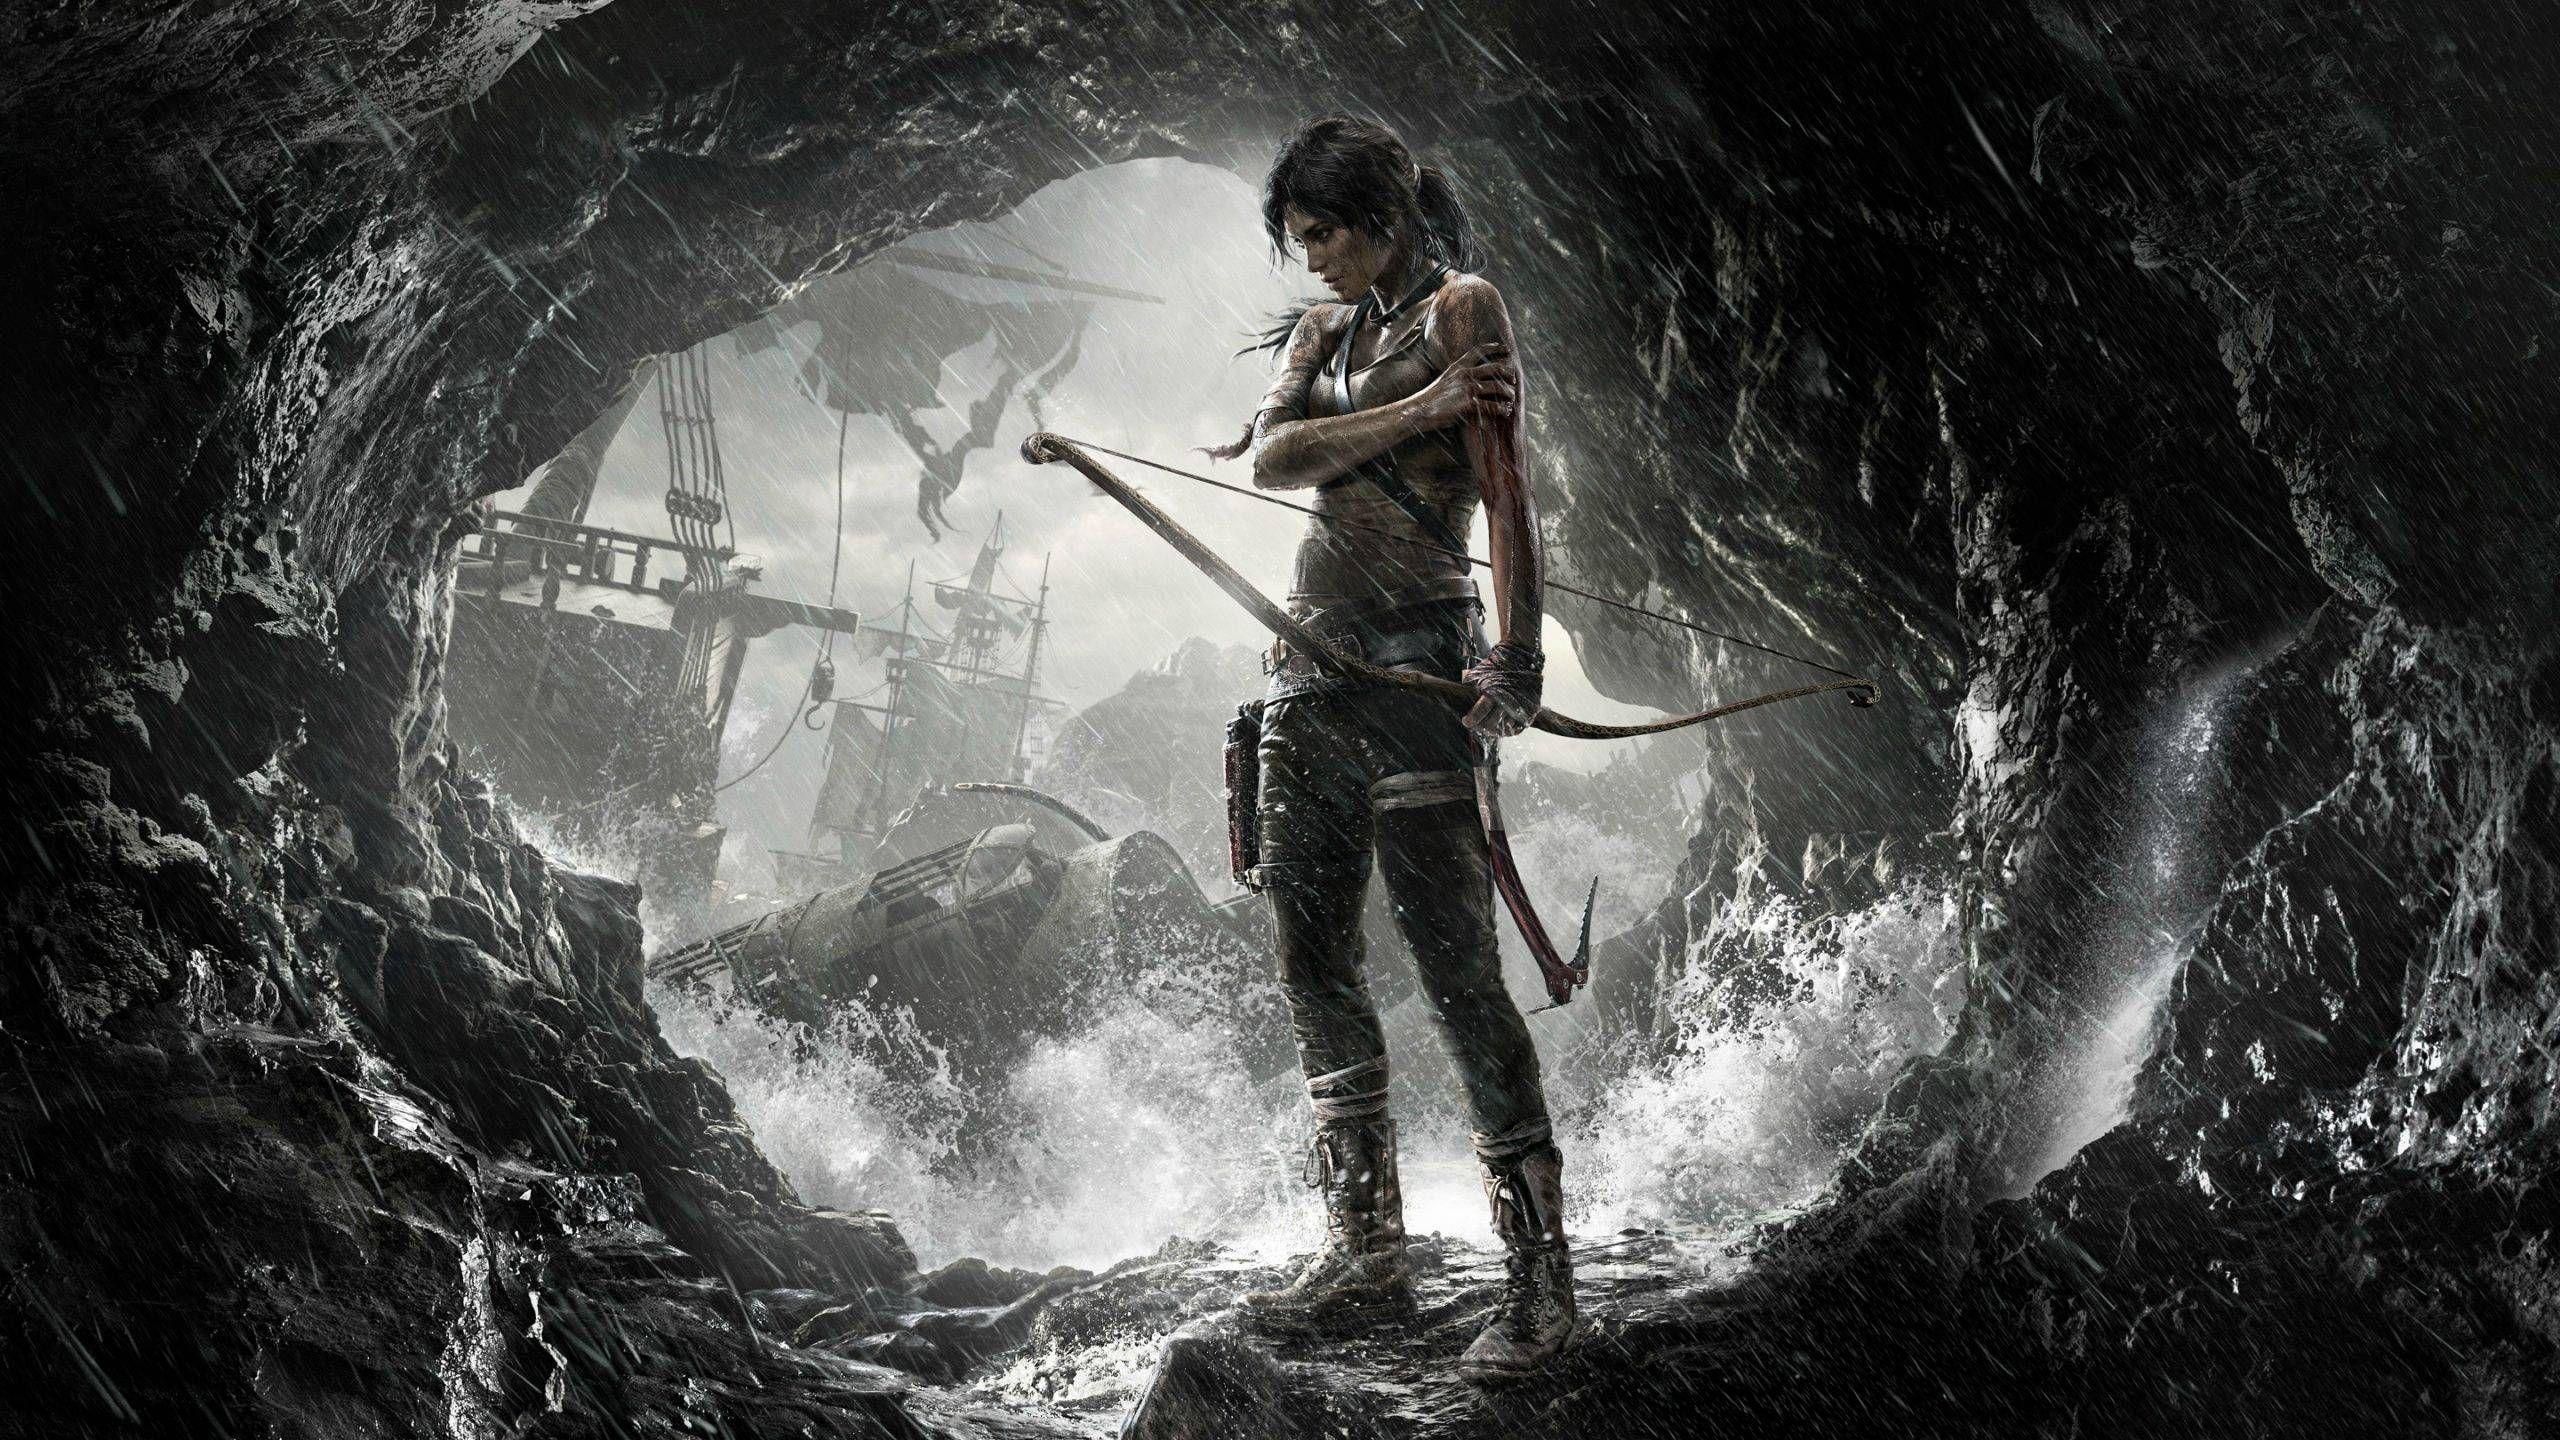 Tomb Raider Wallpaper Google Search Tomb Raider Lara Croft